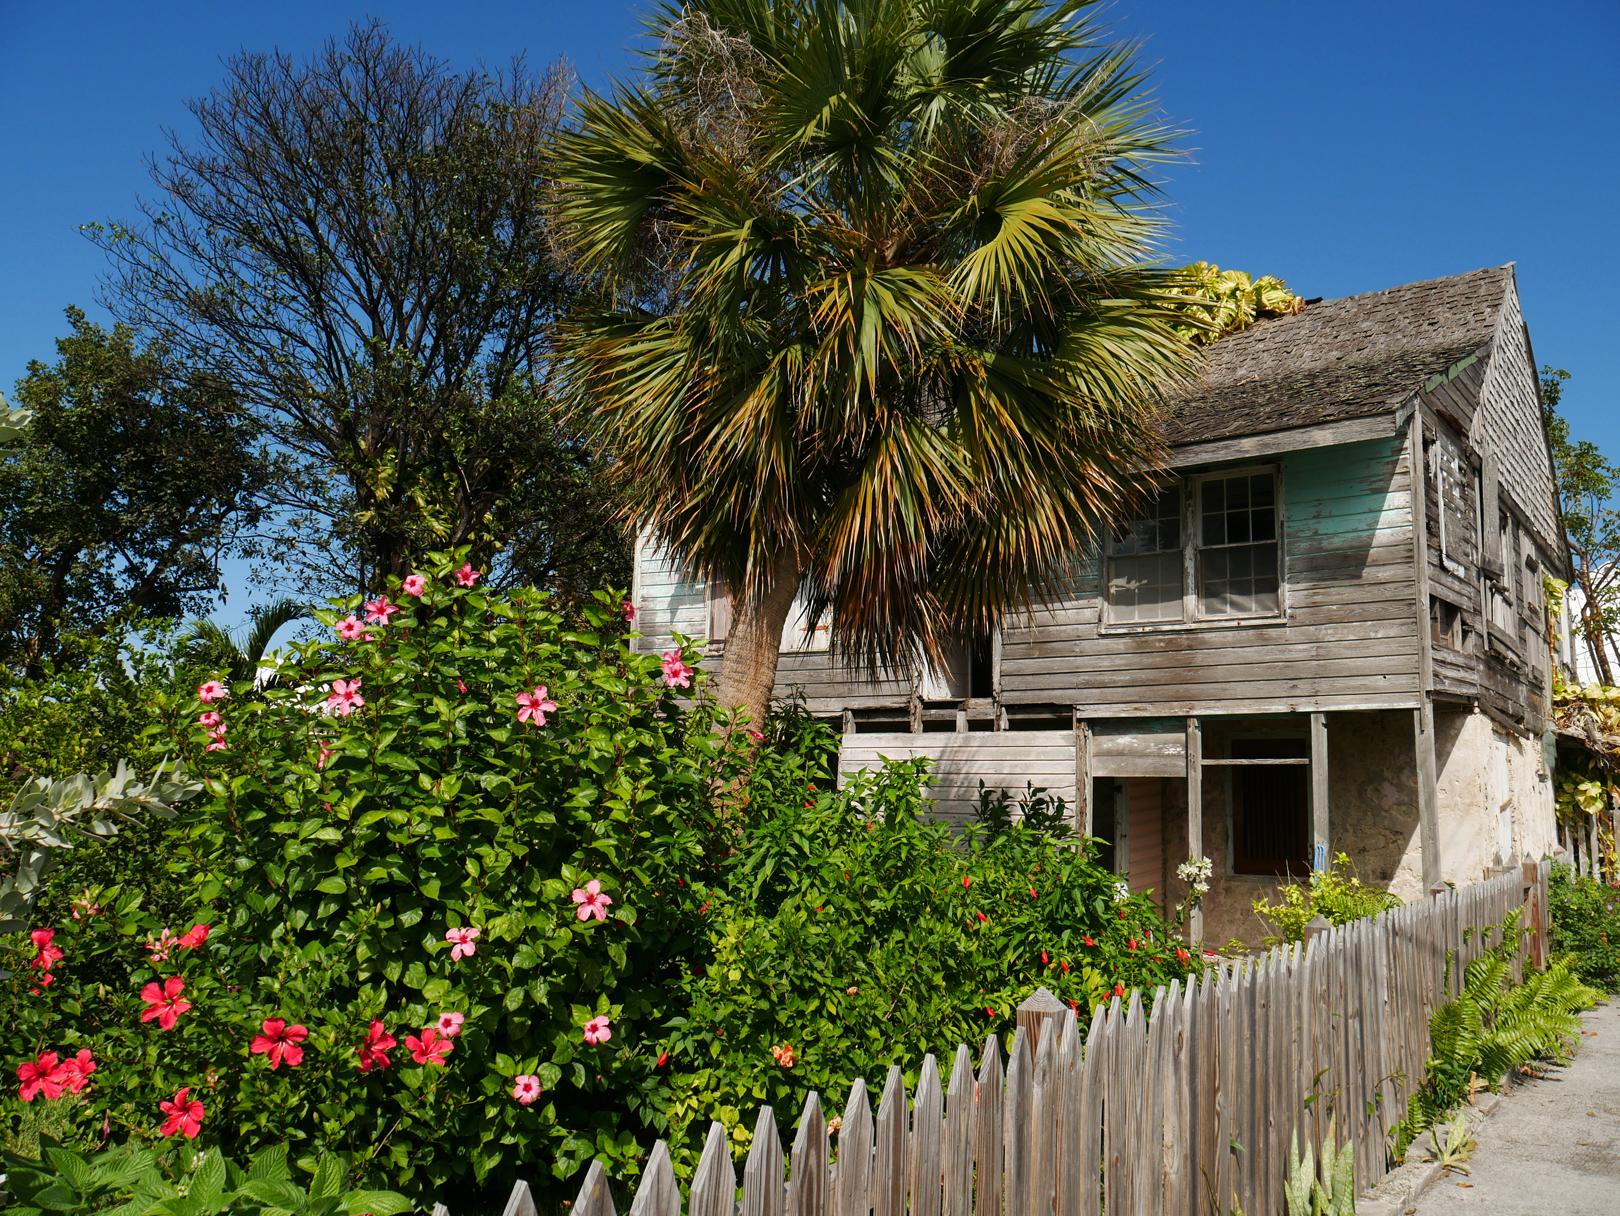 The boyhood home of British Prime Minister, Neville Chamberlain. Green Turtle Cay, Abaco, Bahamas.